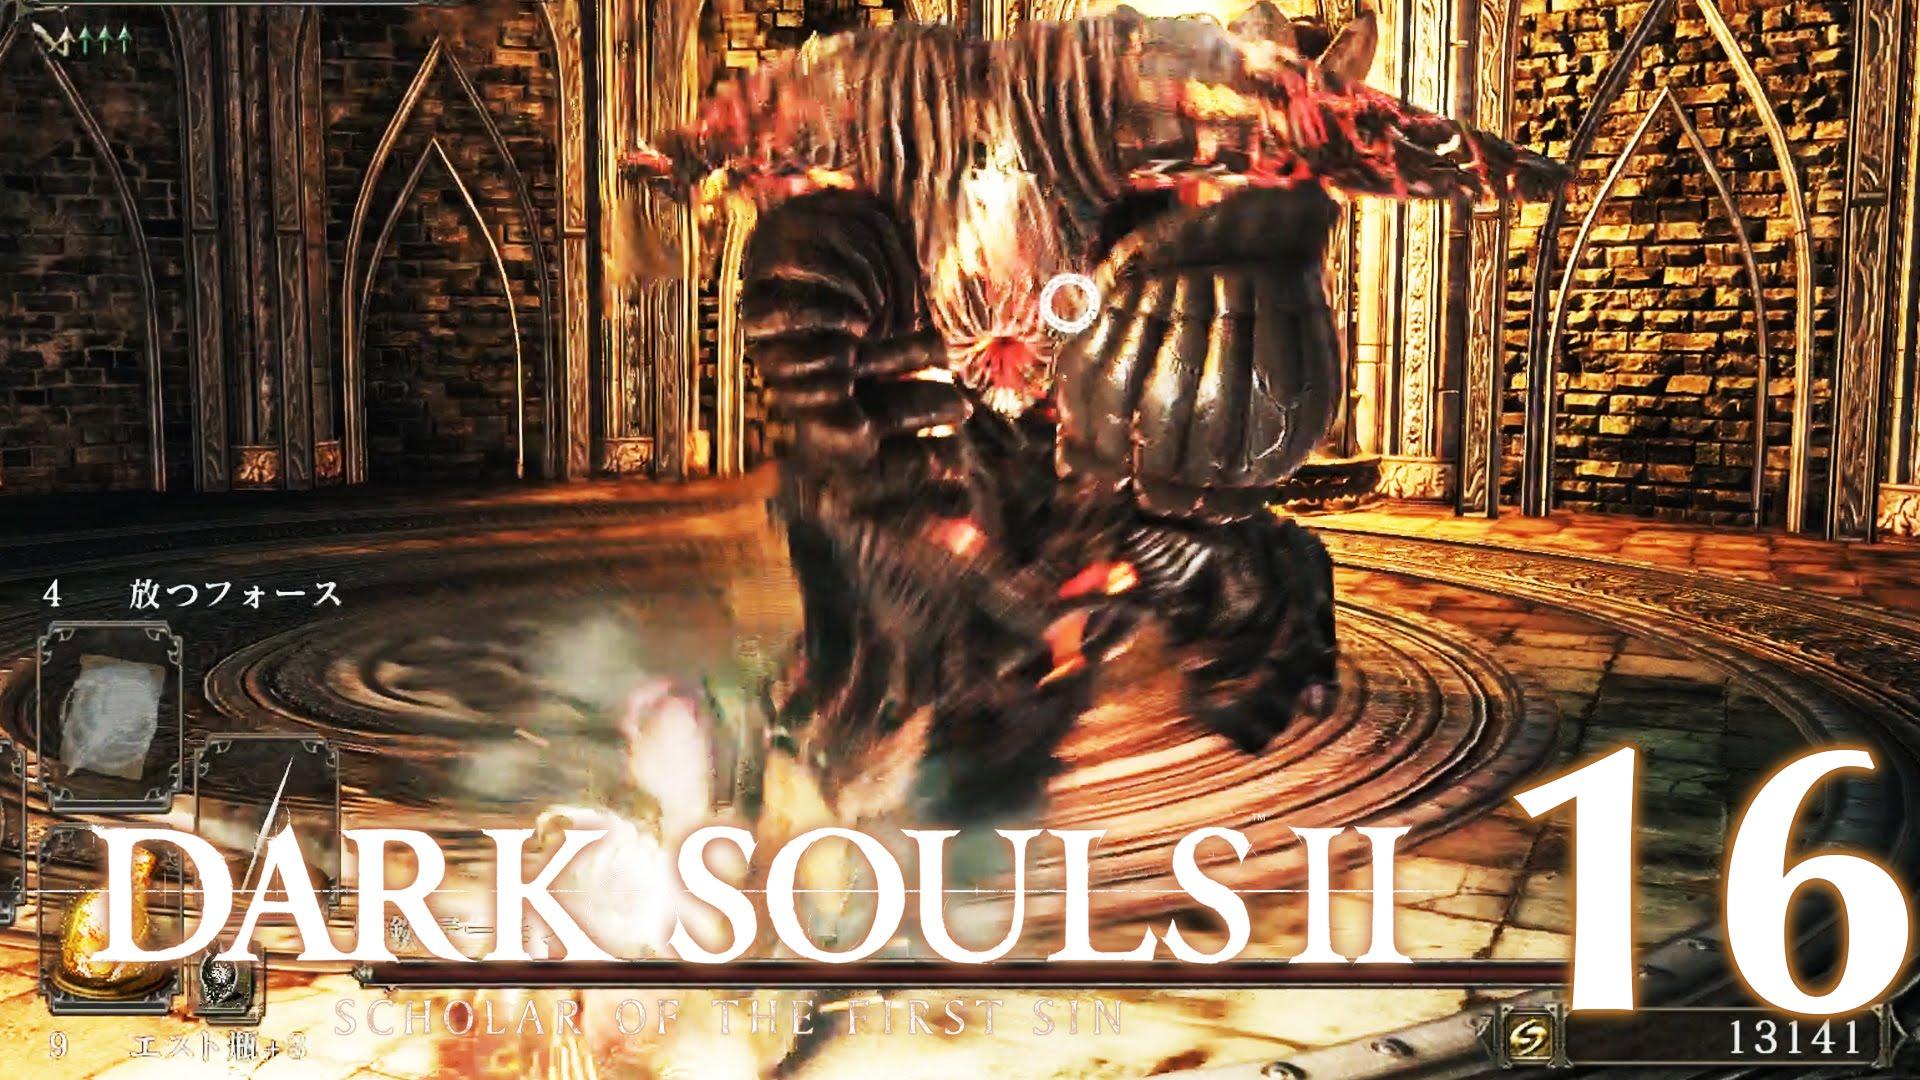 #16【PC版】SCHOLAR OF THE FIRST SIN | DARKSOULS Ⅱ【溶鉄城】